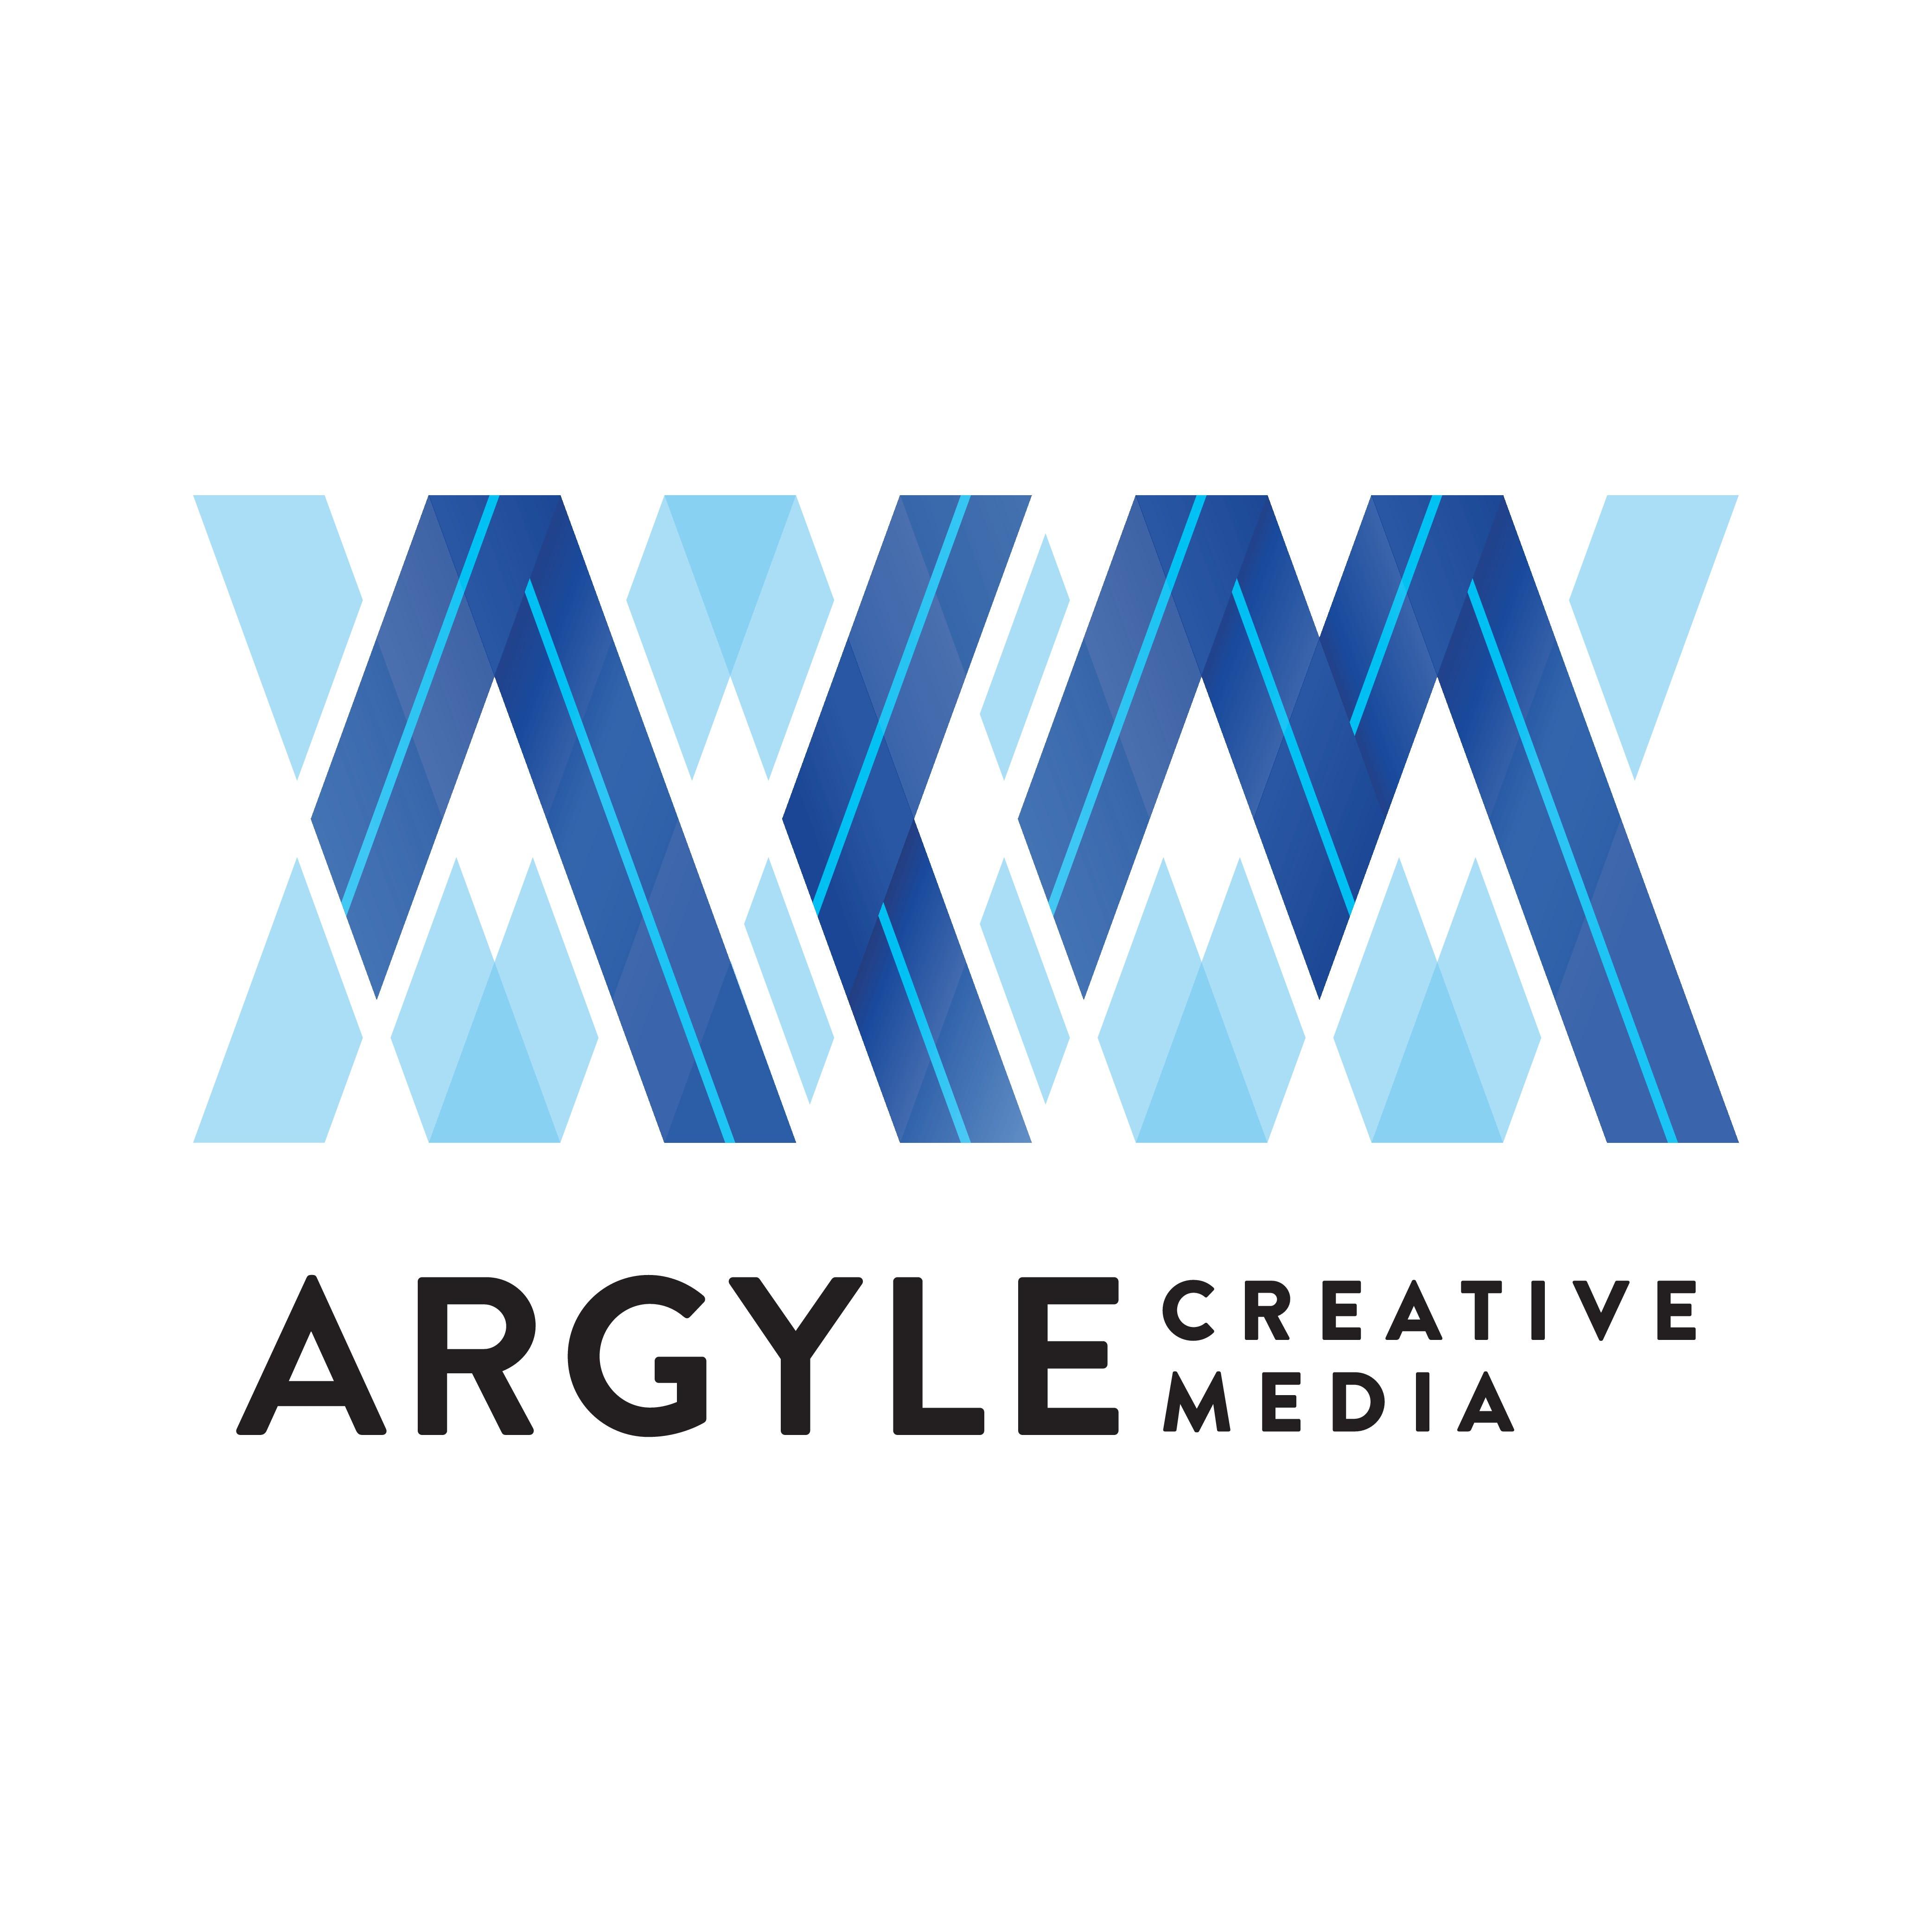 Create a design for a new media company